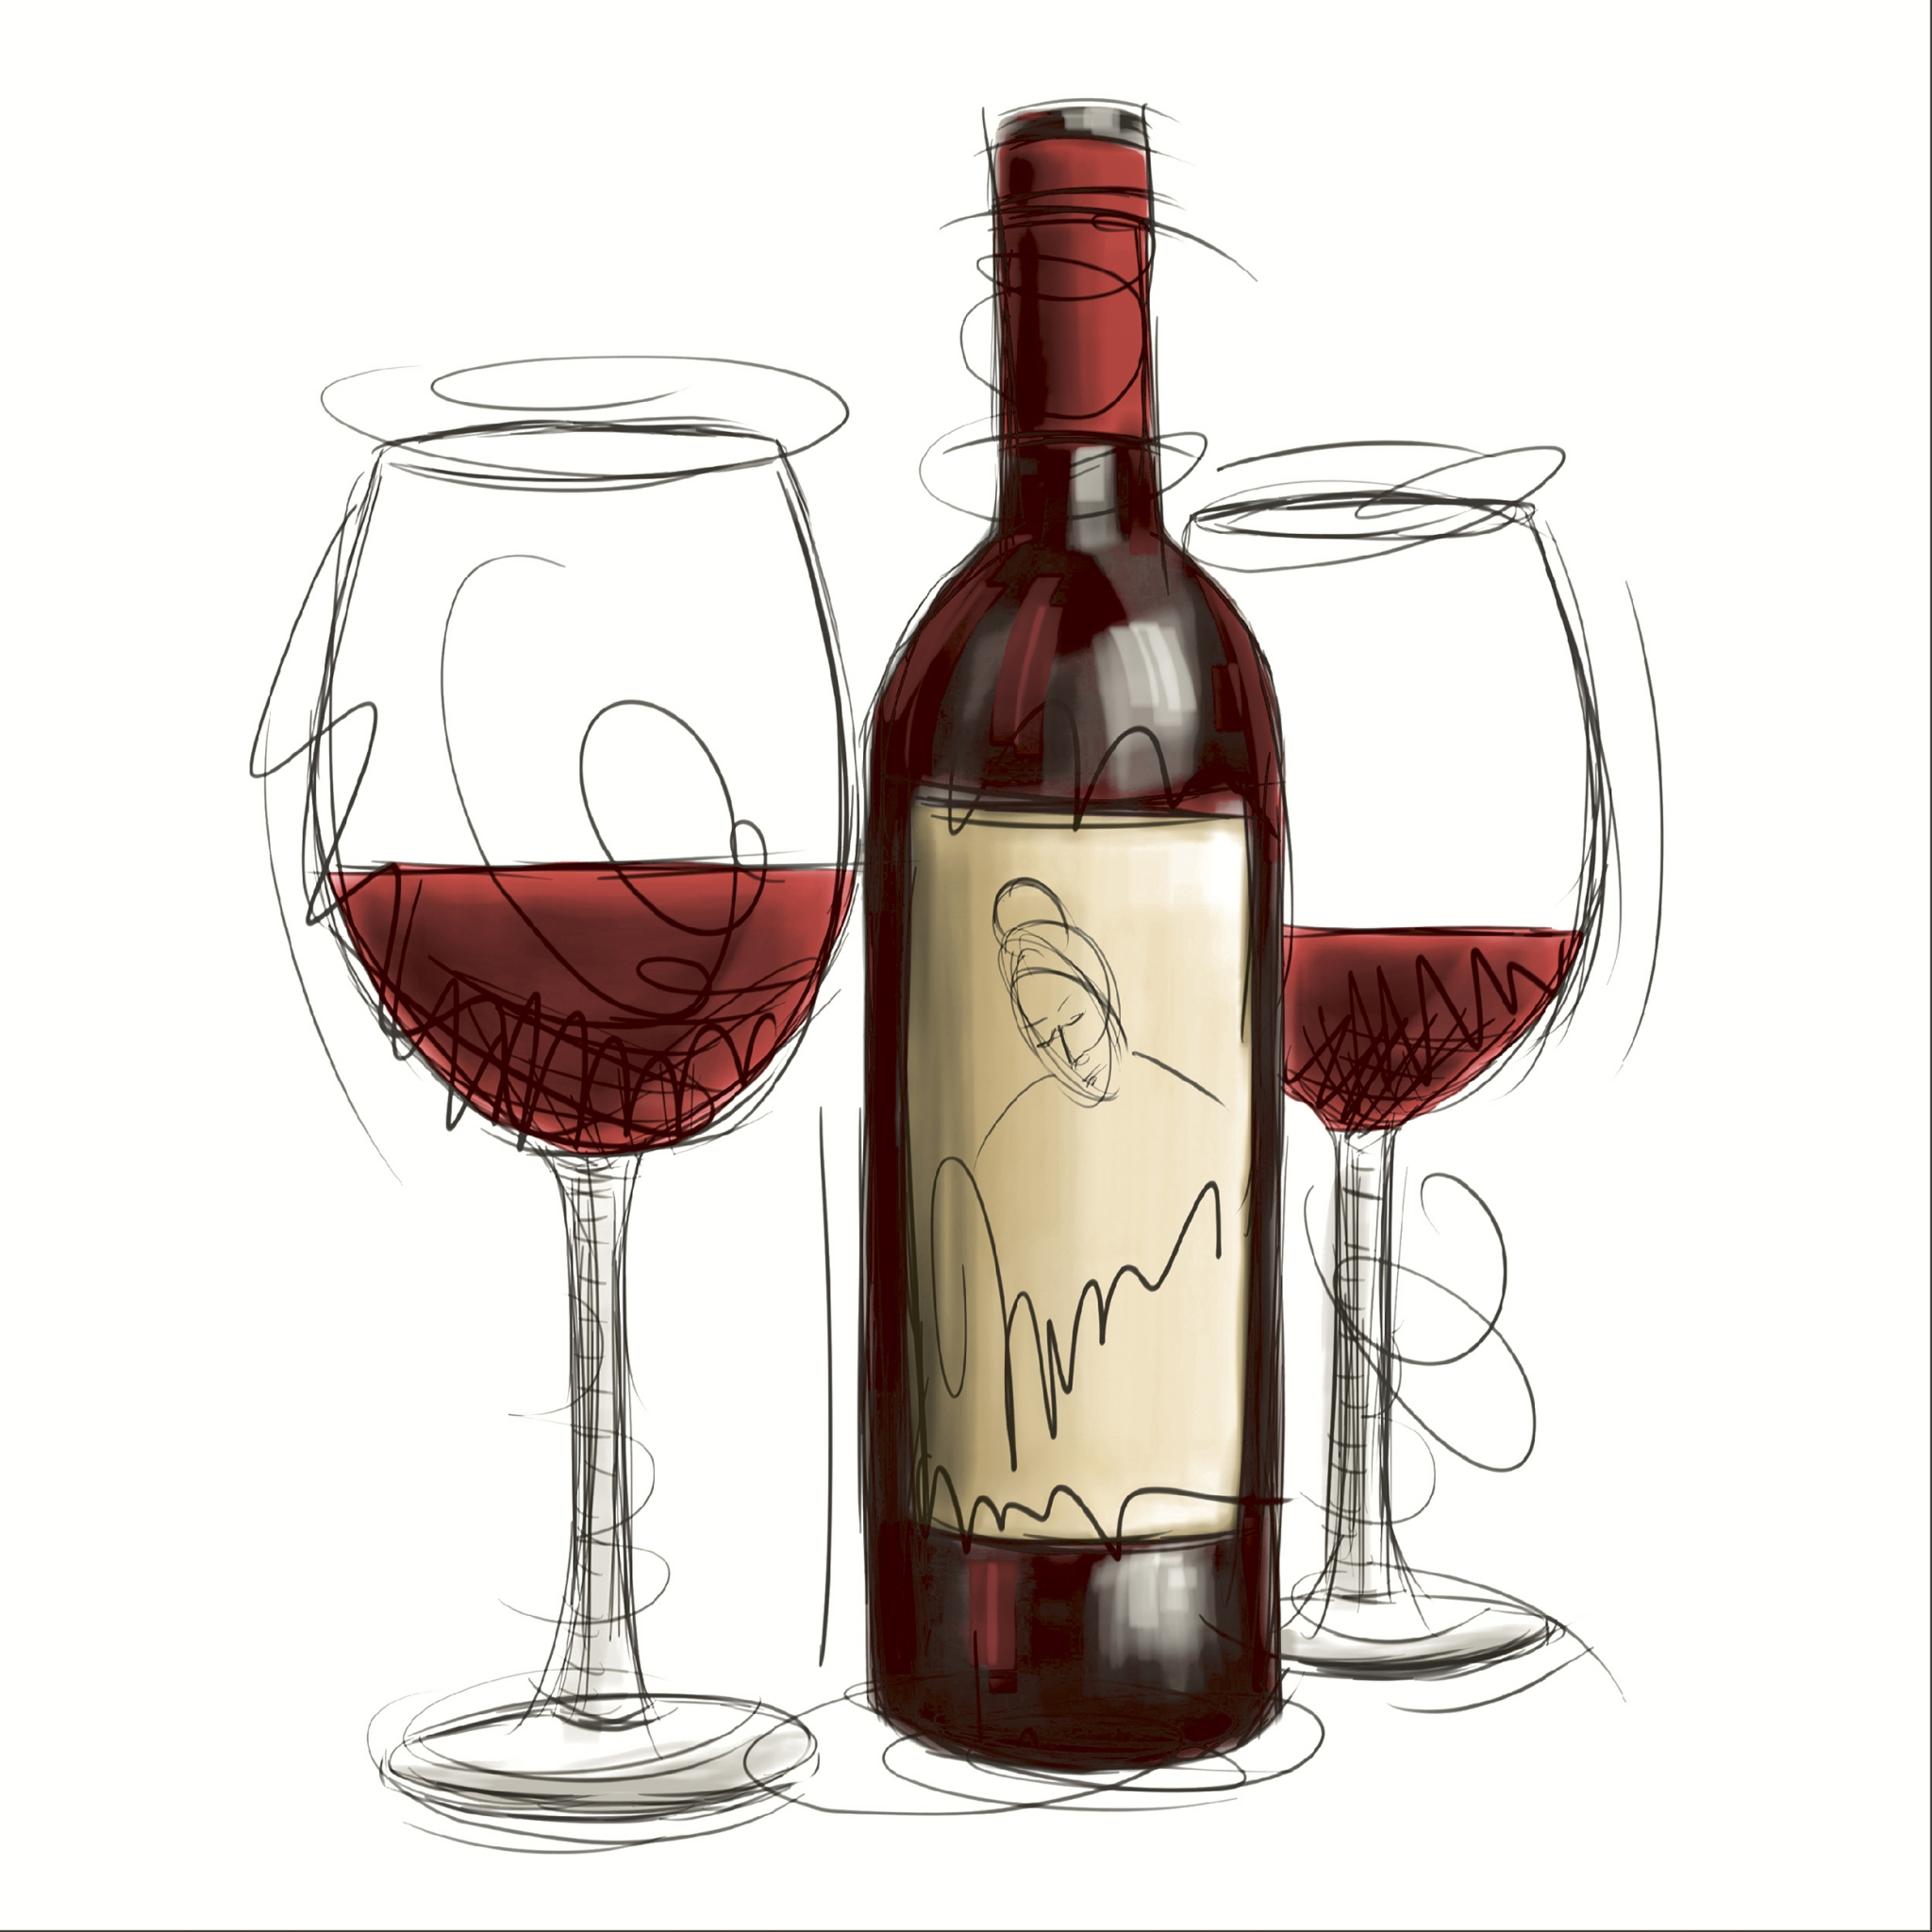 Napkins 24x24 cm - Vino rosso